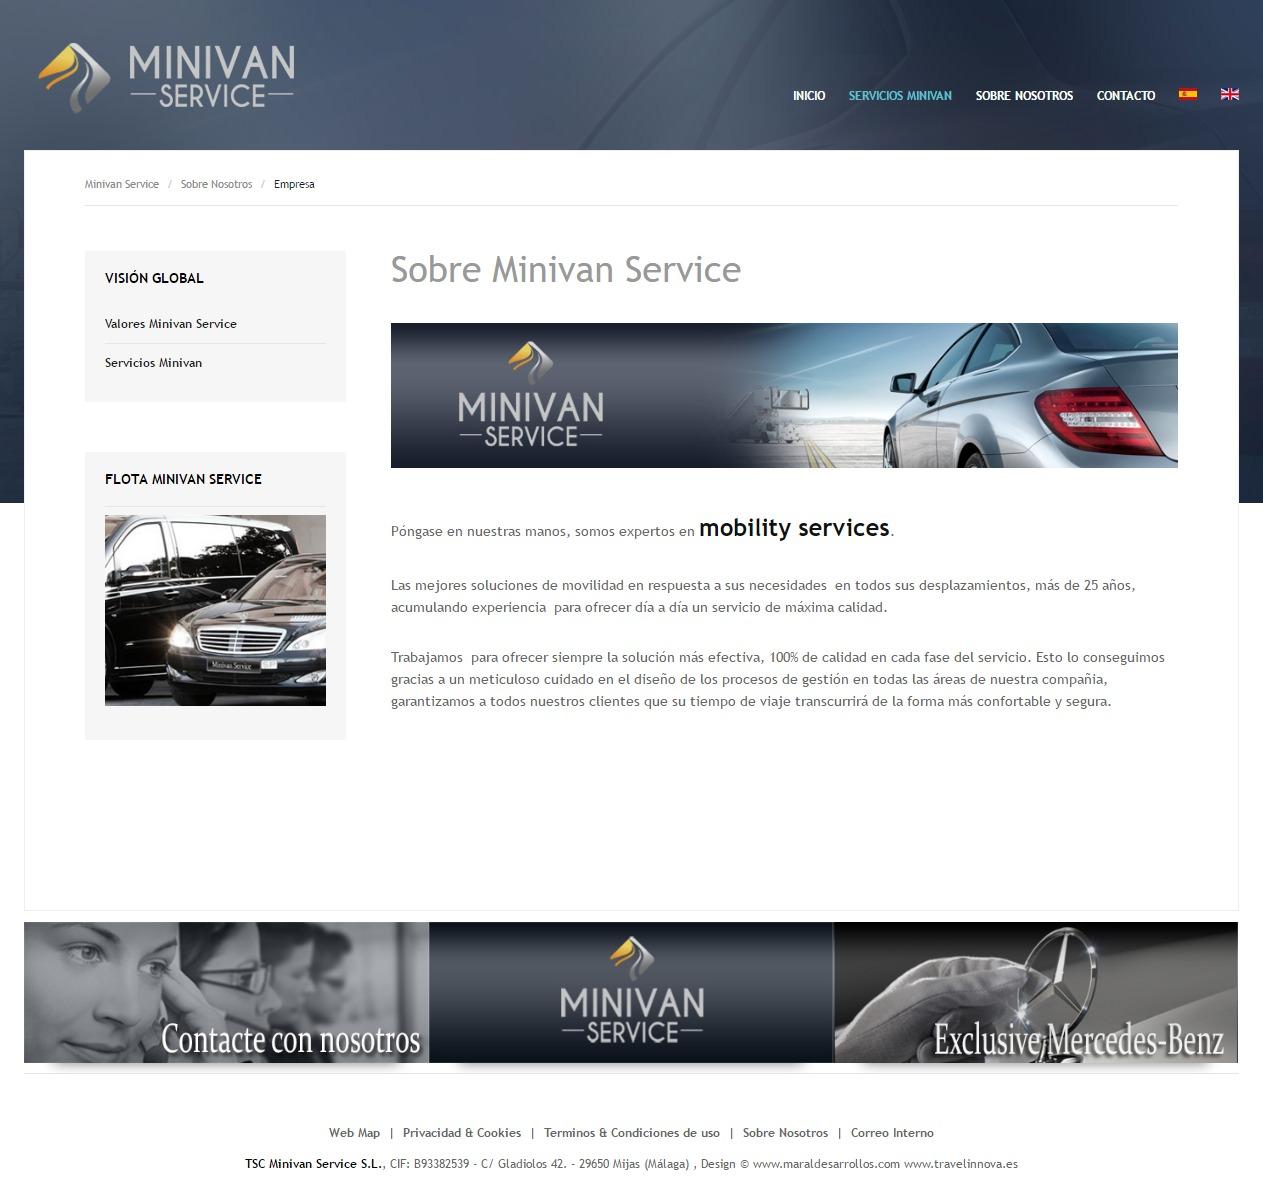 003-tsc-minivan-about